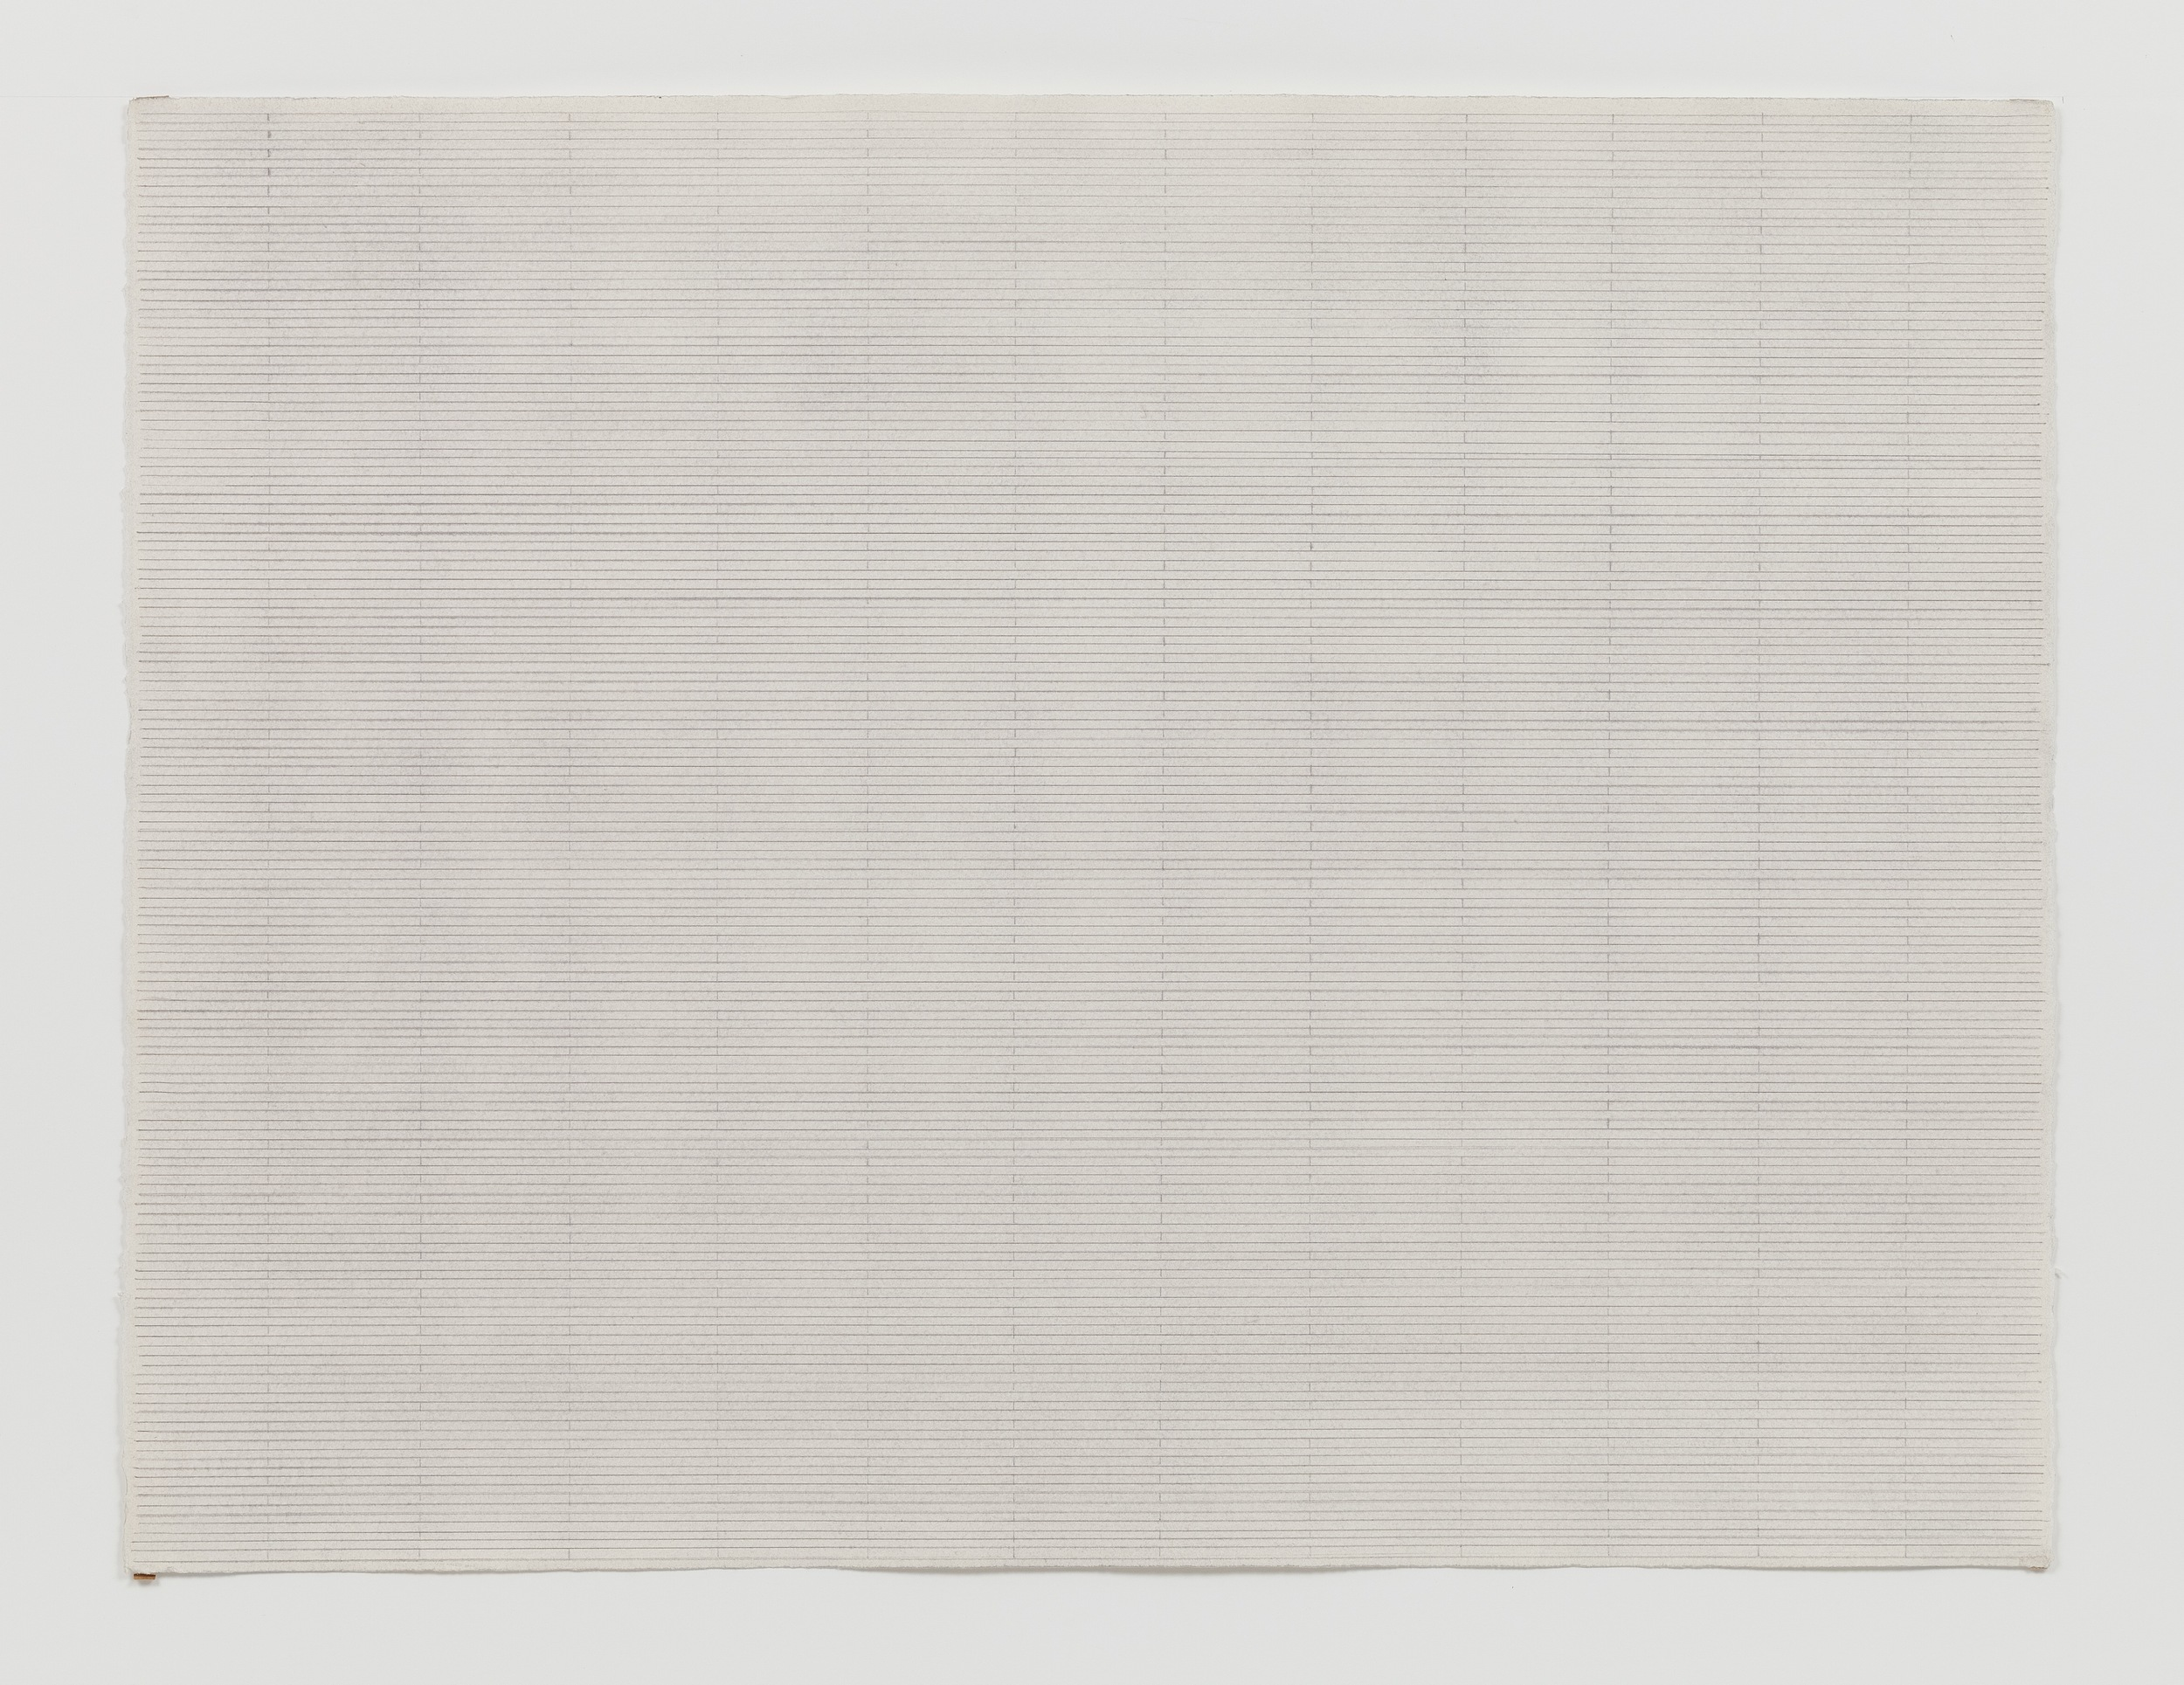 Rudolf de Crignis, Painting No. 92009, 1992